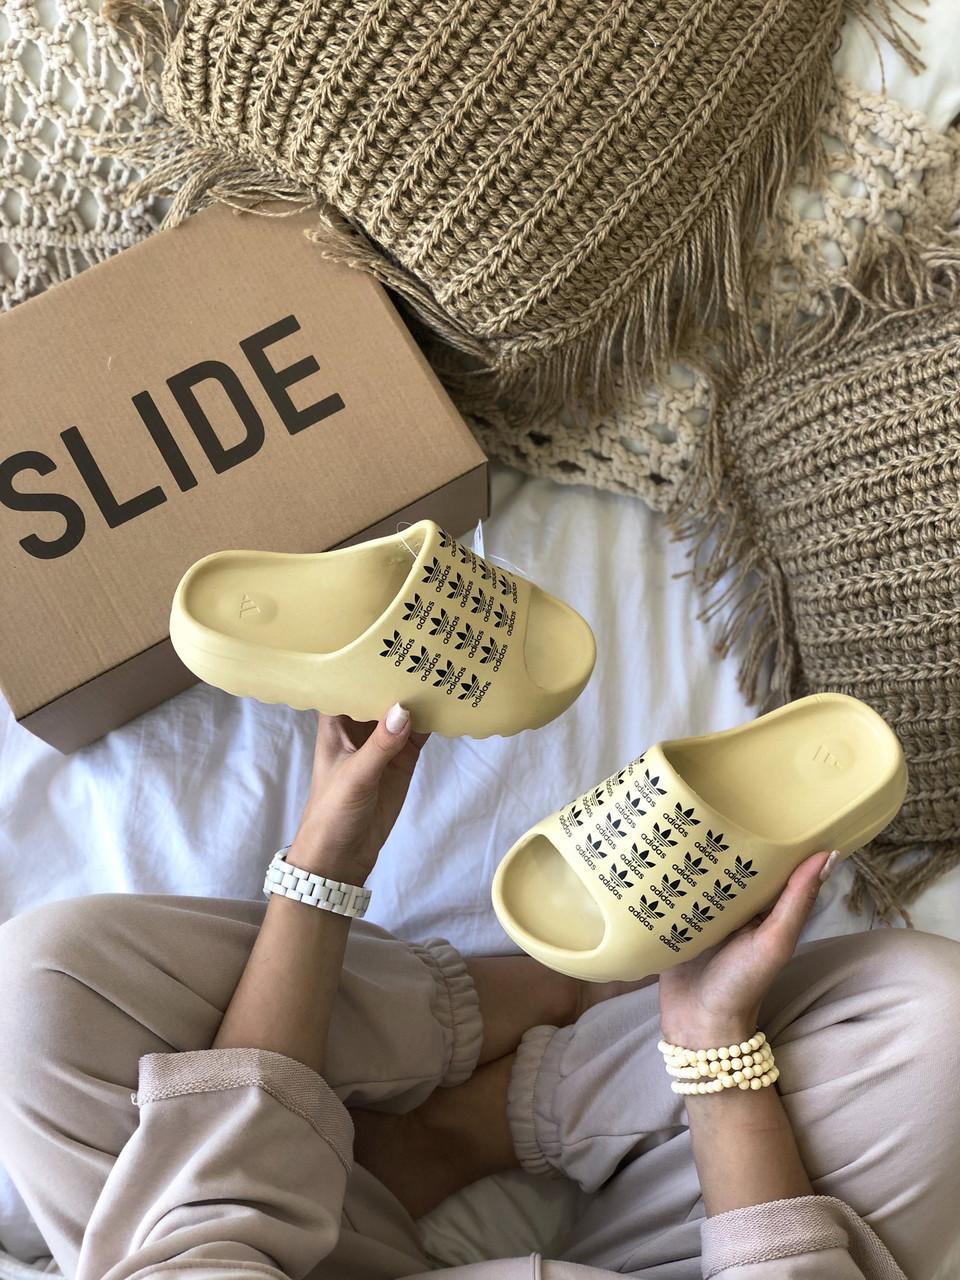 Тапки / Шлепанцы Adidas Yeezy Slide